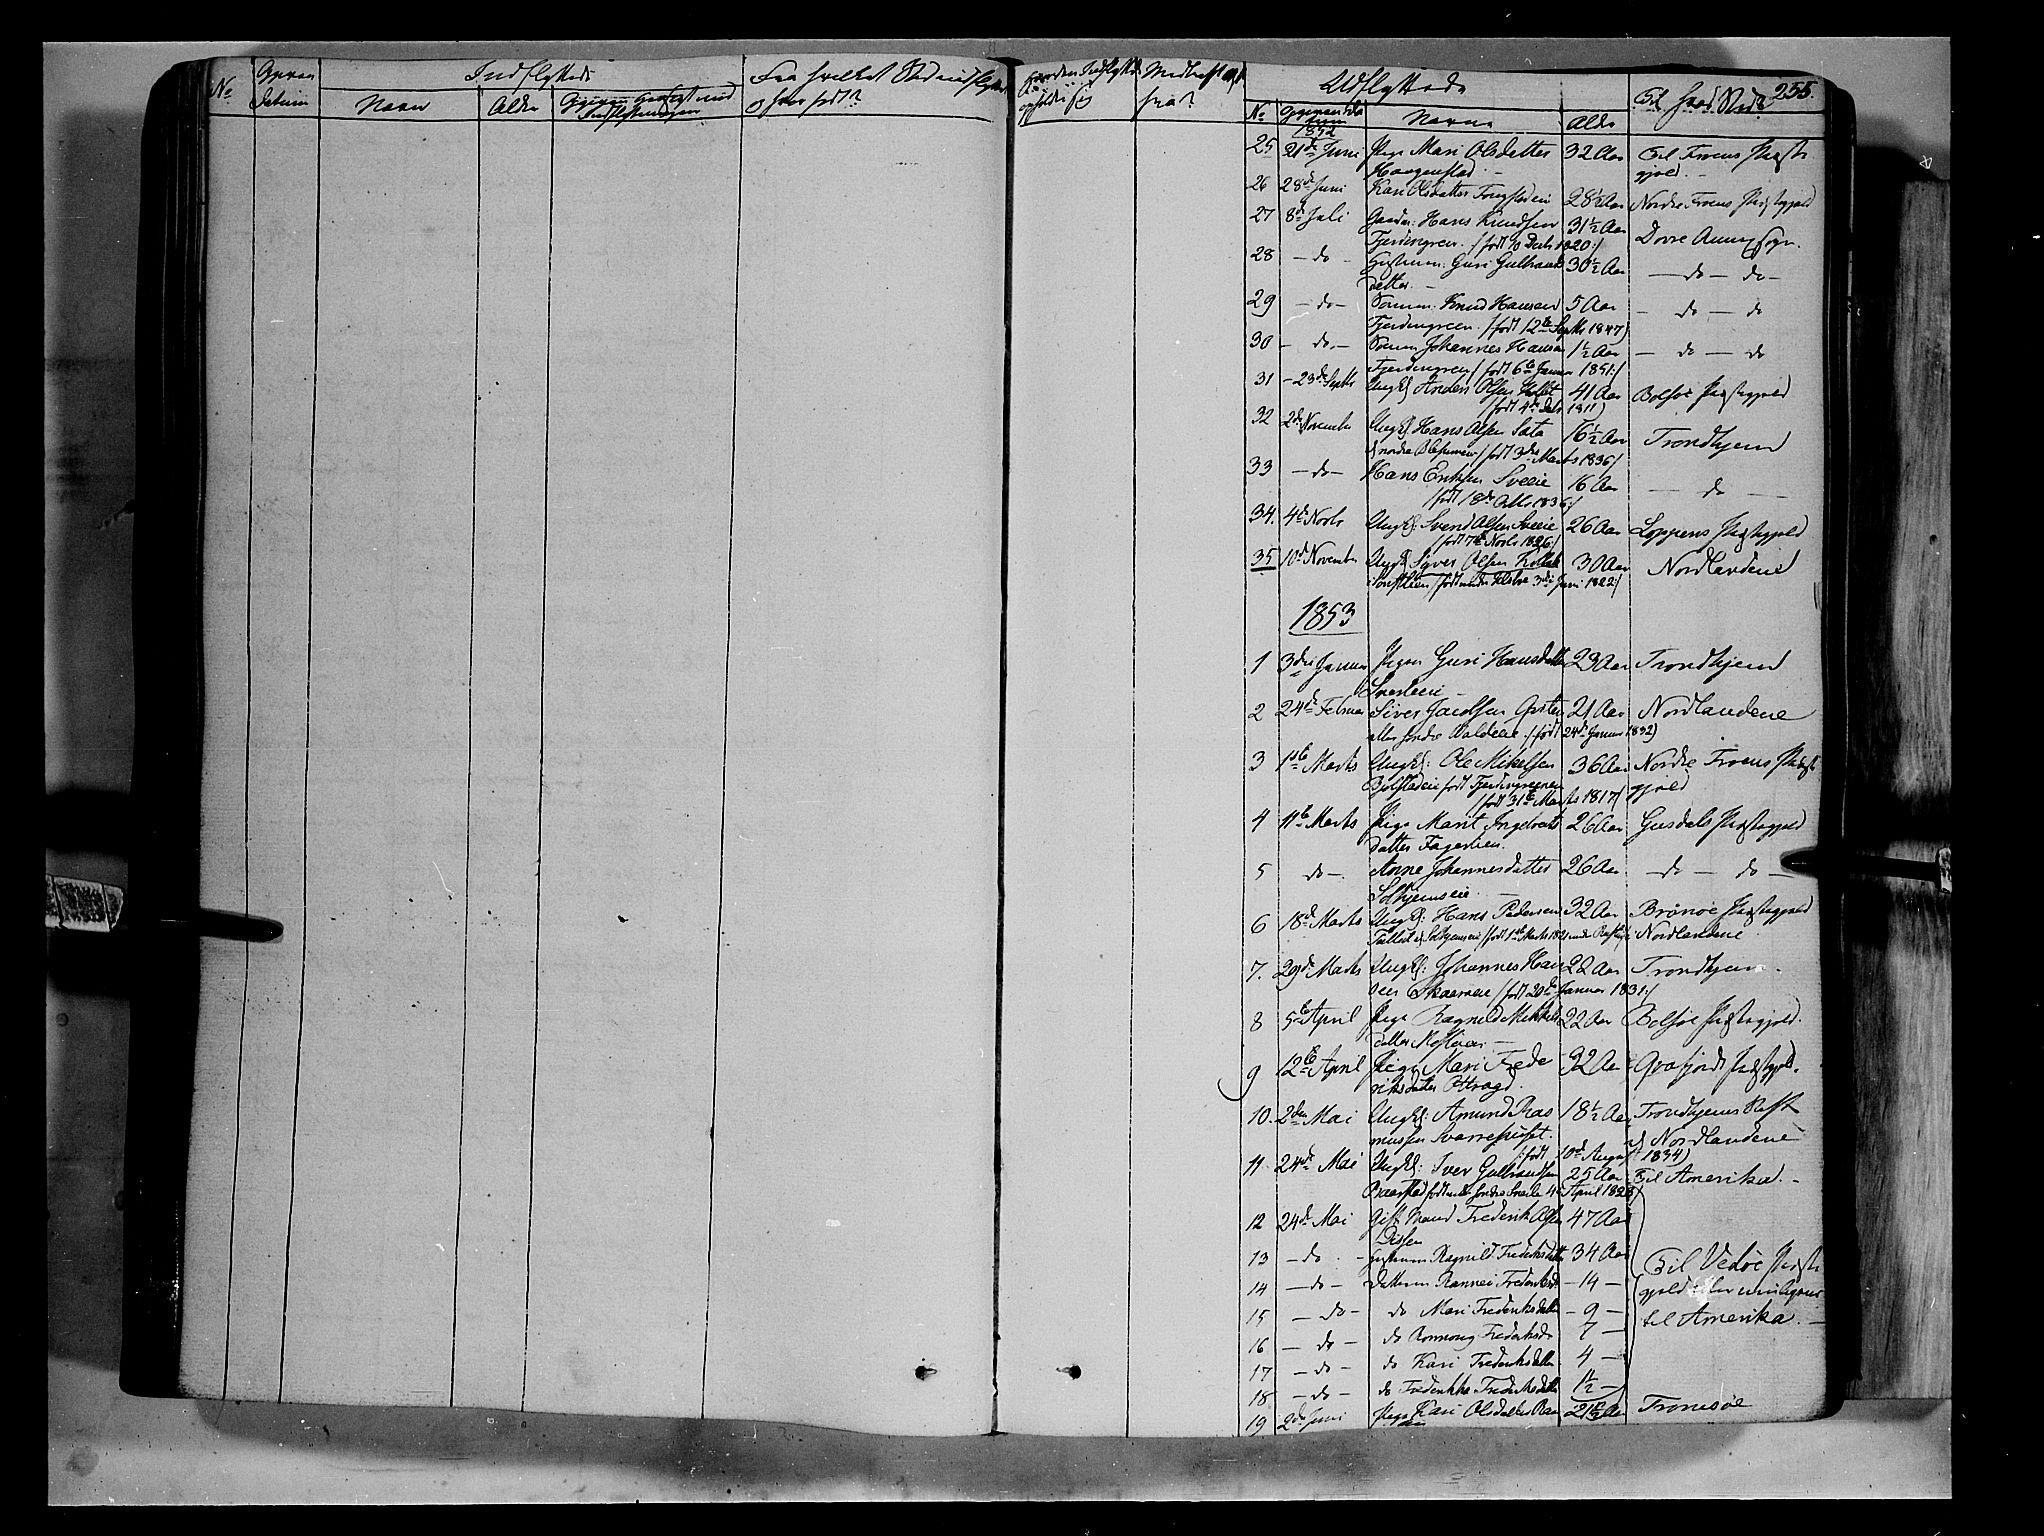 SAH, Vågå prestekontor, Ministerialbok nr. 5 /1, 1842-1856, s. 255